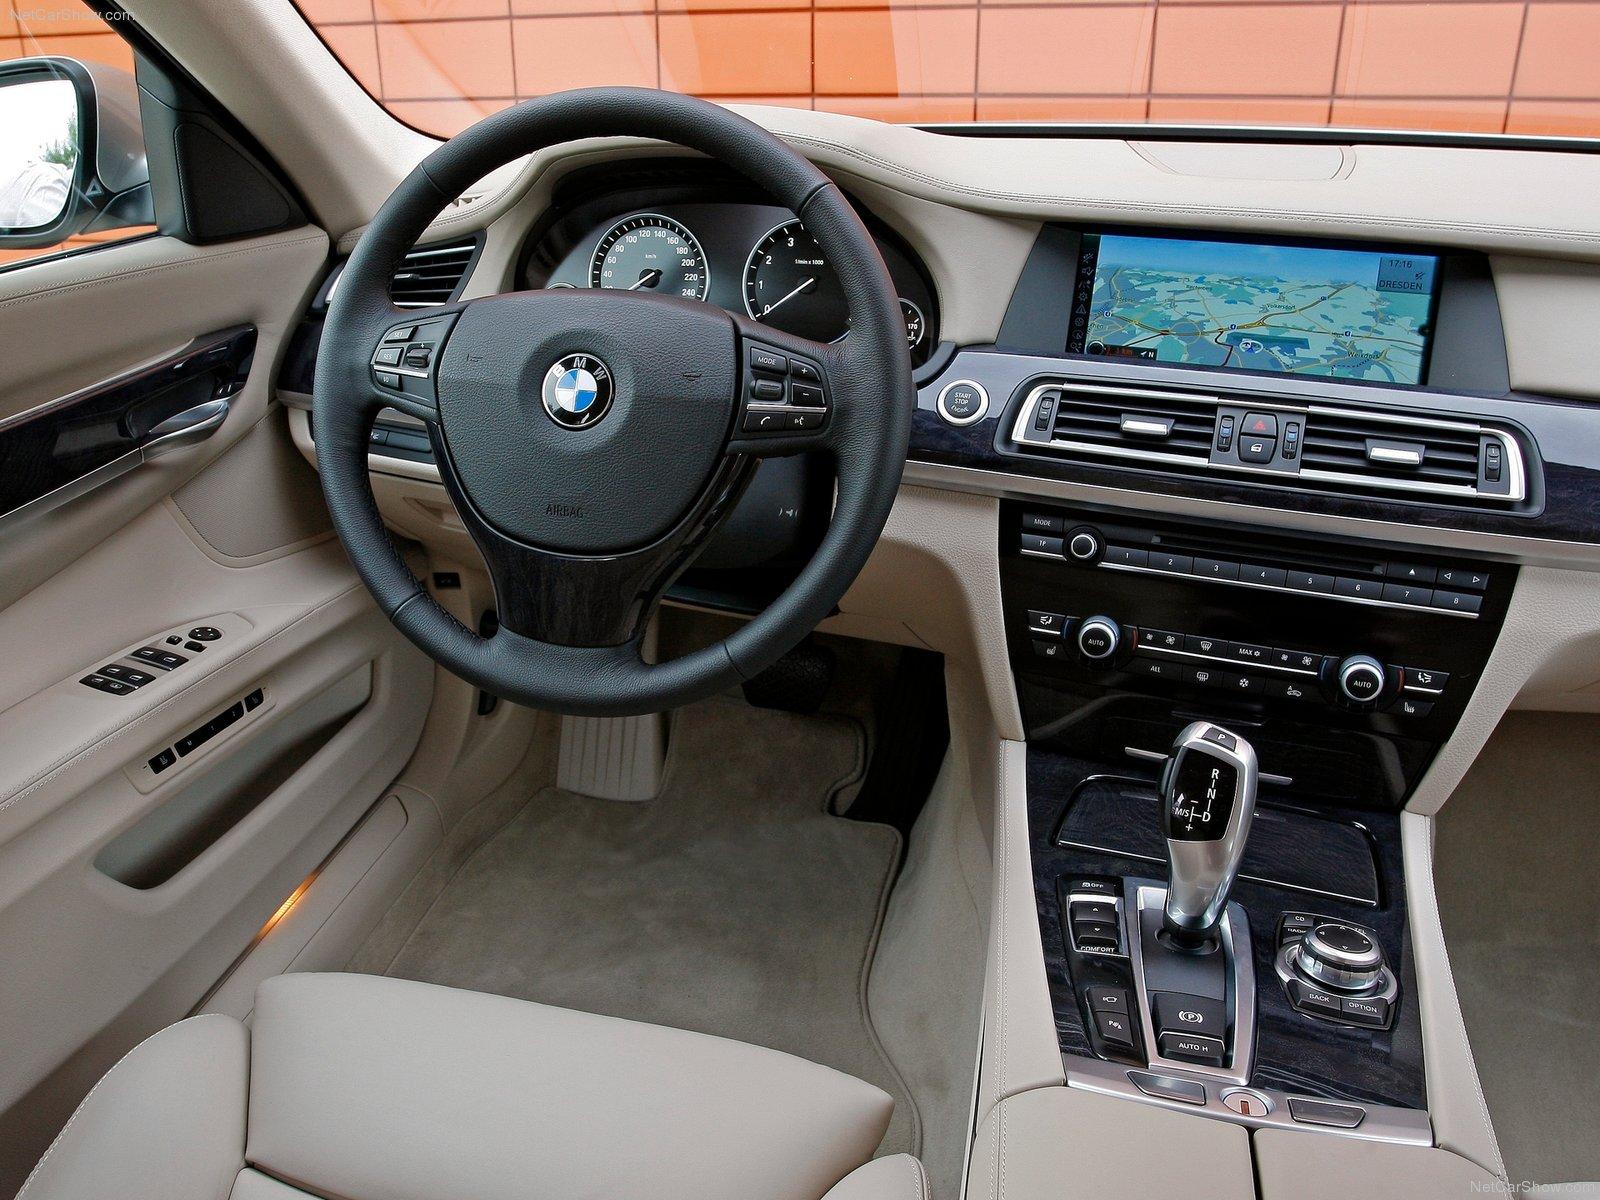 Фото салона BMW 7-series L. Интерьер BMW 7-series L.